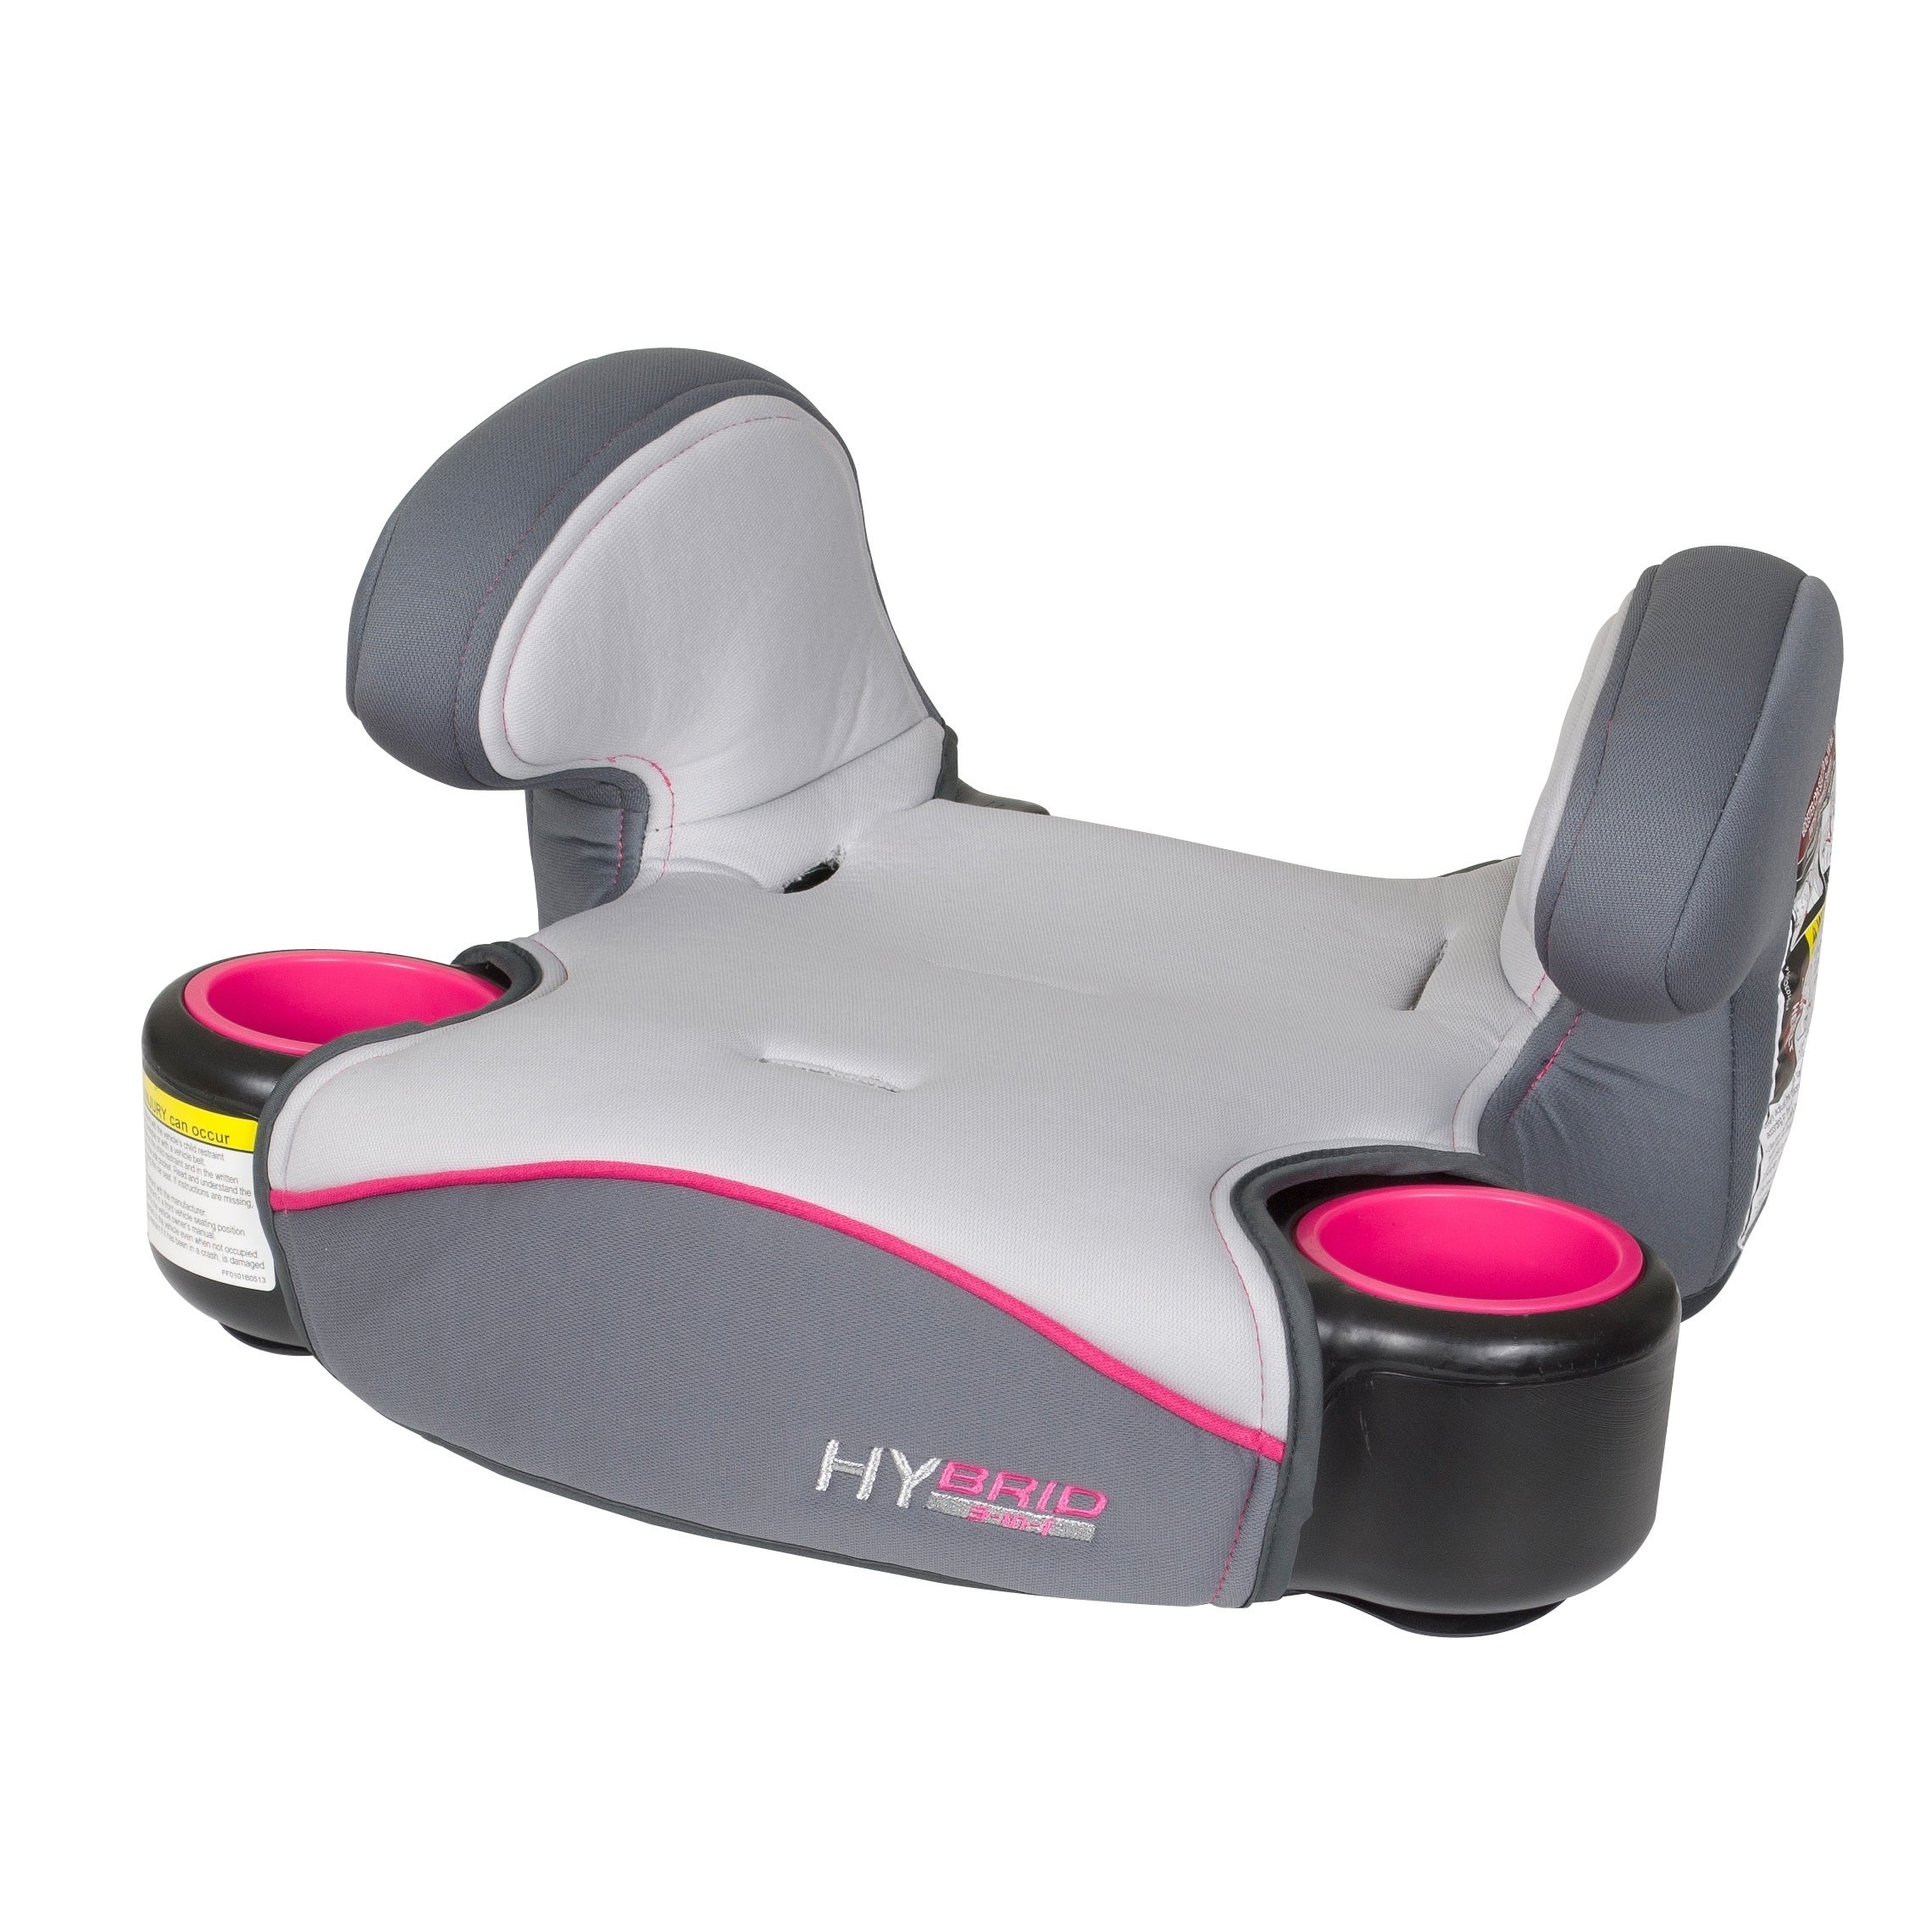 Shop Baby Trend Hybrid 3 In 1 Car SeatMelody